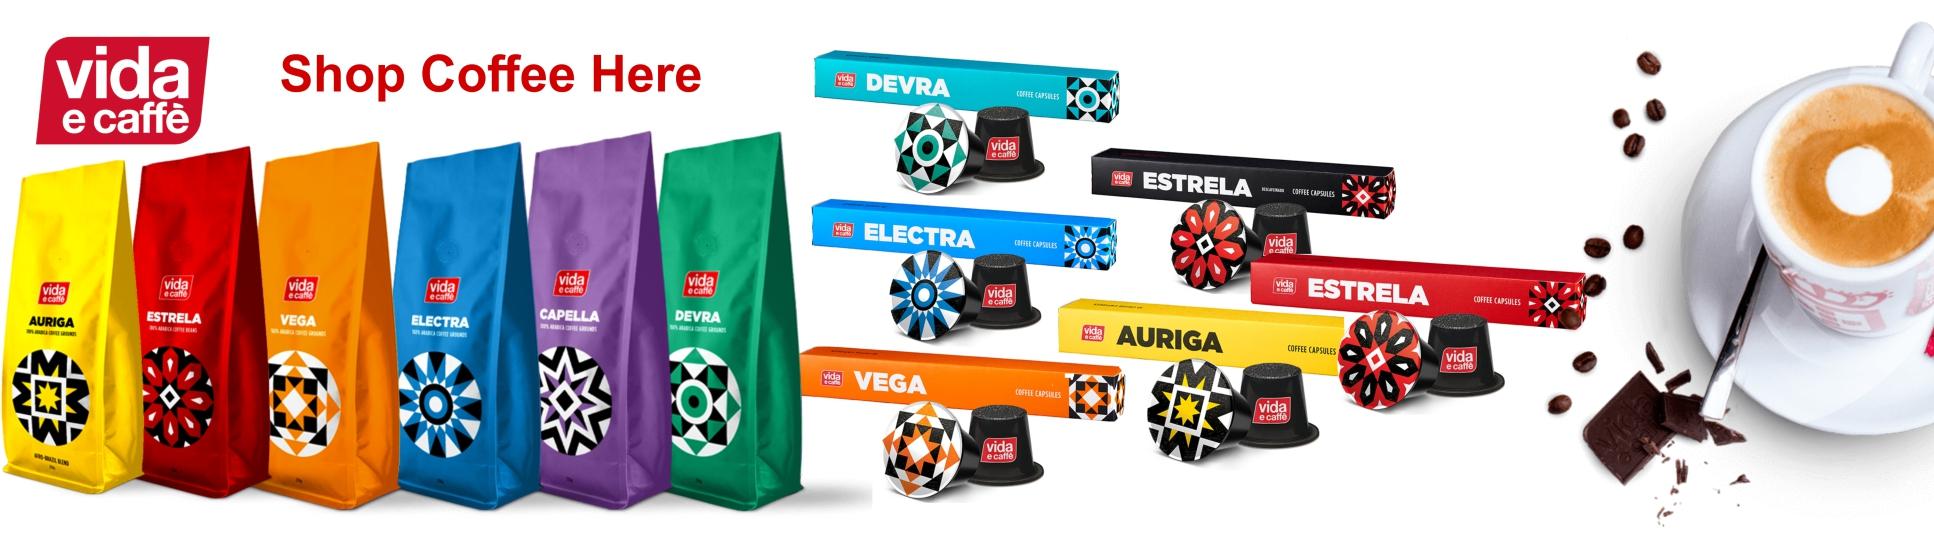 Vida-E-Coffee-Banner